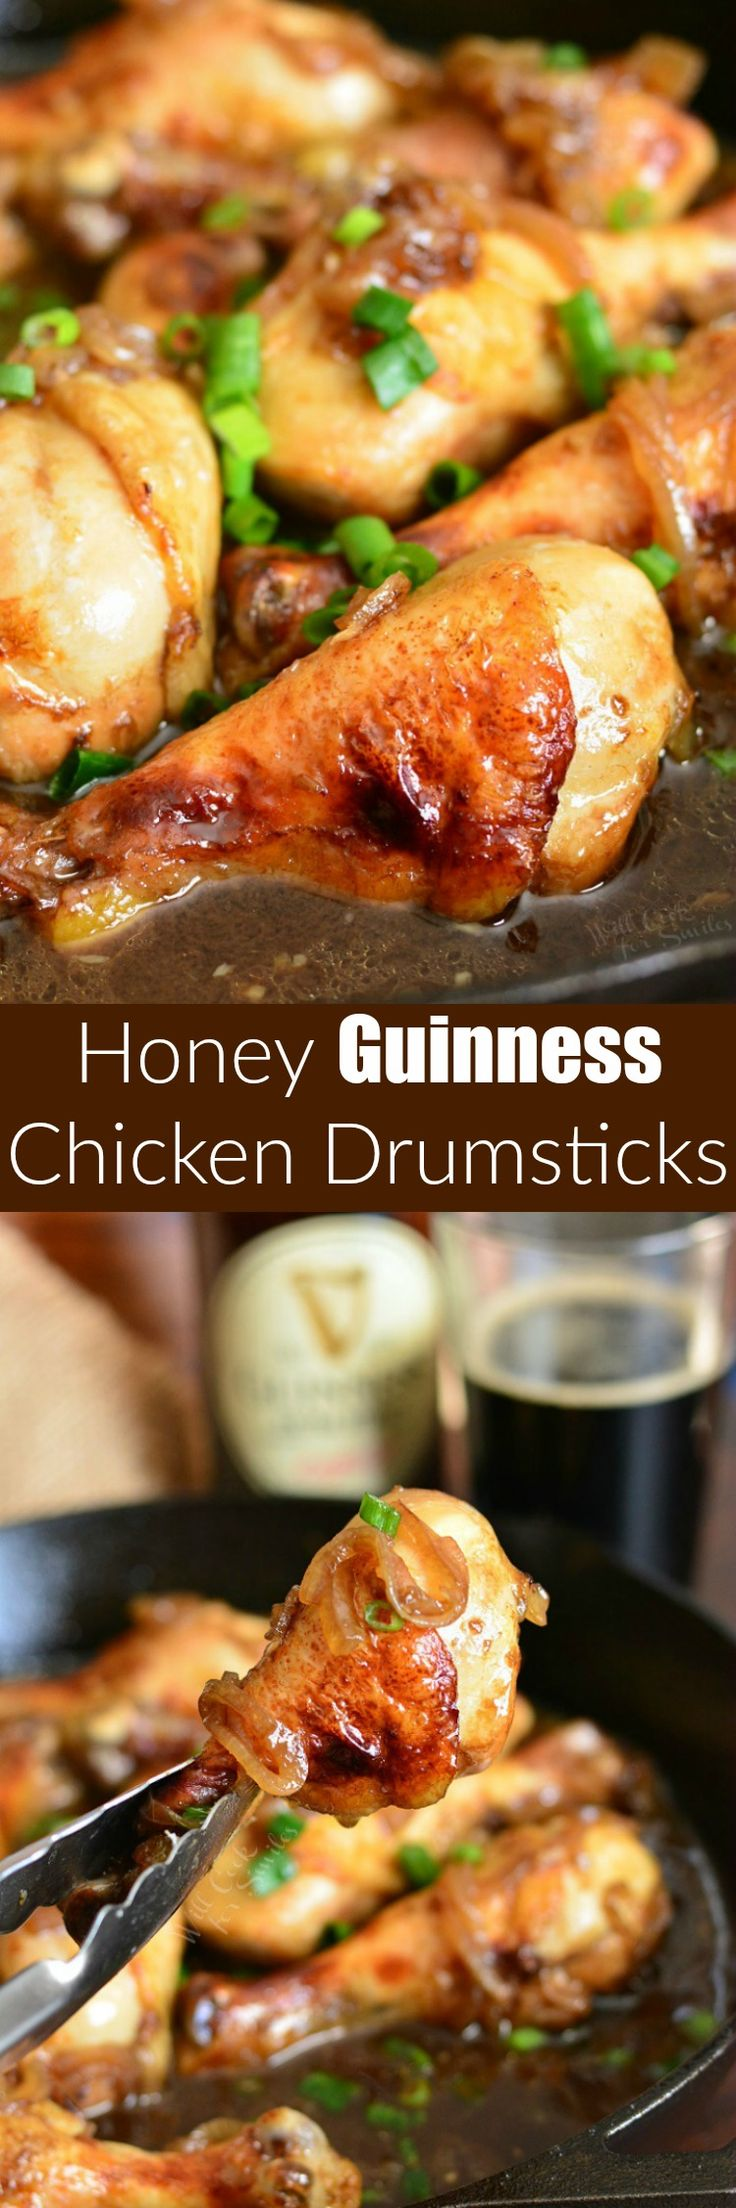 Honey Guinness Chicken Drumsticks. These Honey Guinness Chicken Drumsticks are first marinated in Honey Guinness sauce, seared, and then baked in the same delicious sauce. #chicken #guinness #chickendrumsticks #guinnessrecipe